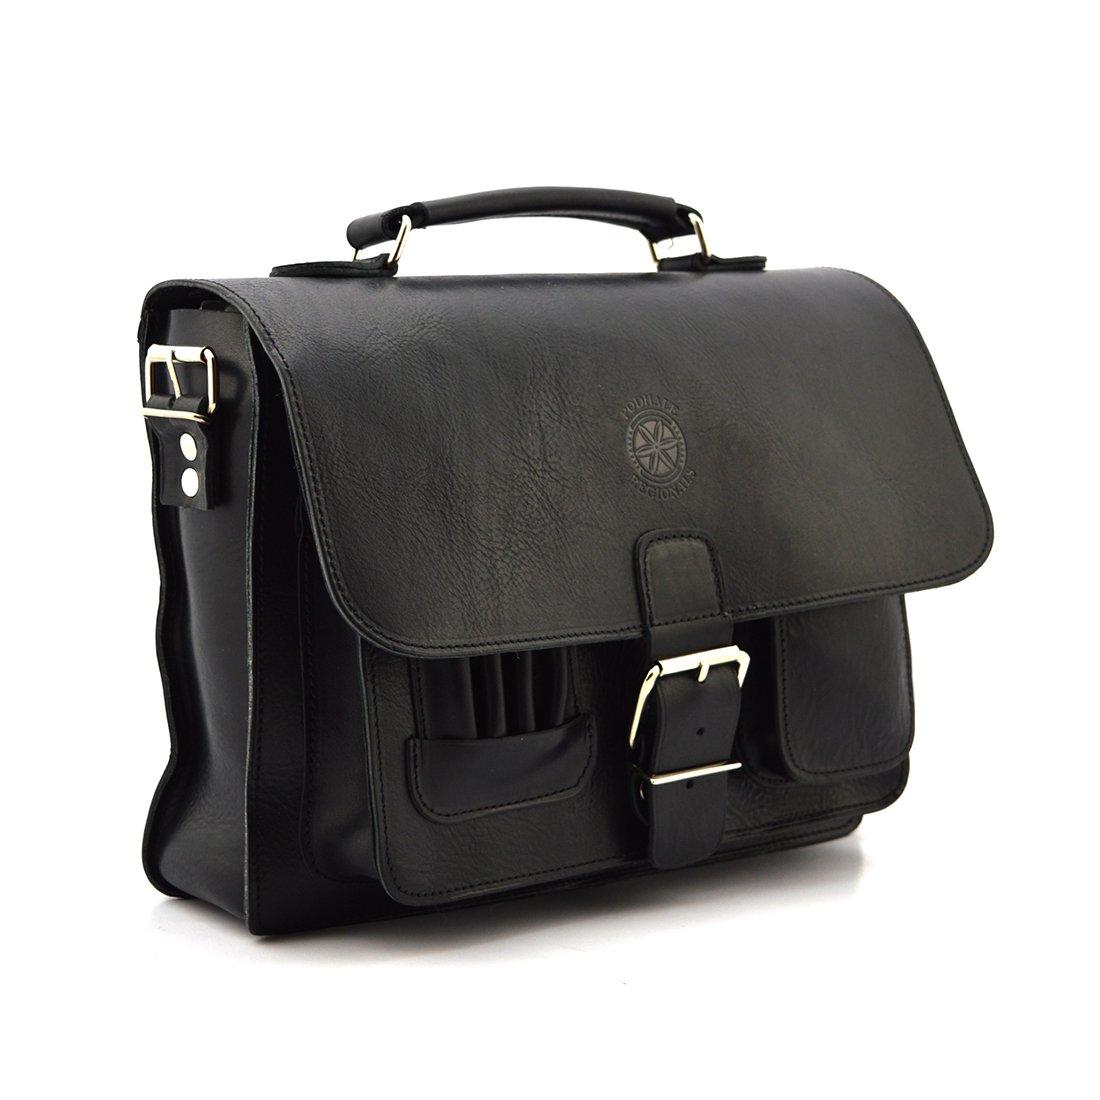 adea188e484cd Klasyczna torba Podhale Regionals b919 deepblack - Skóra juchtowa premium    deepblack - Kup teraz Online